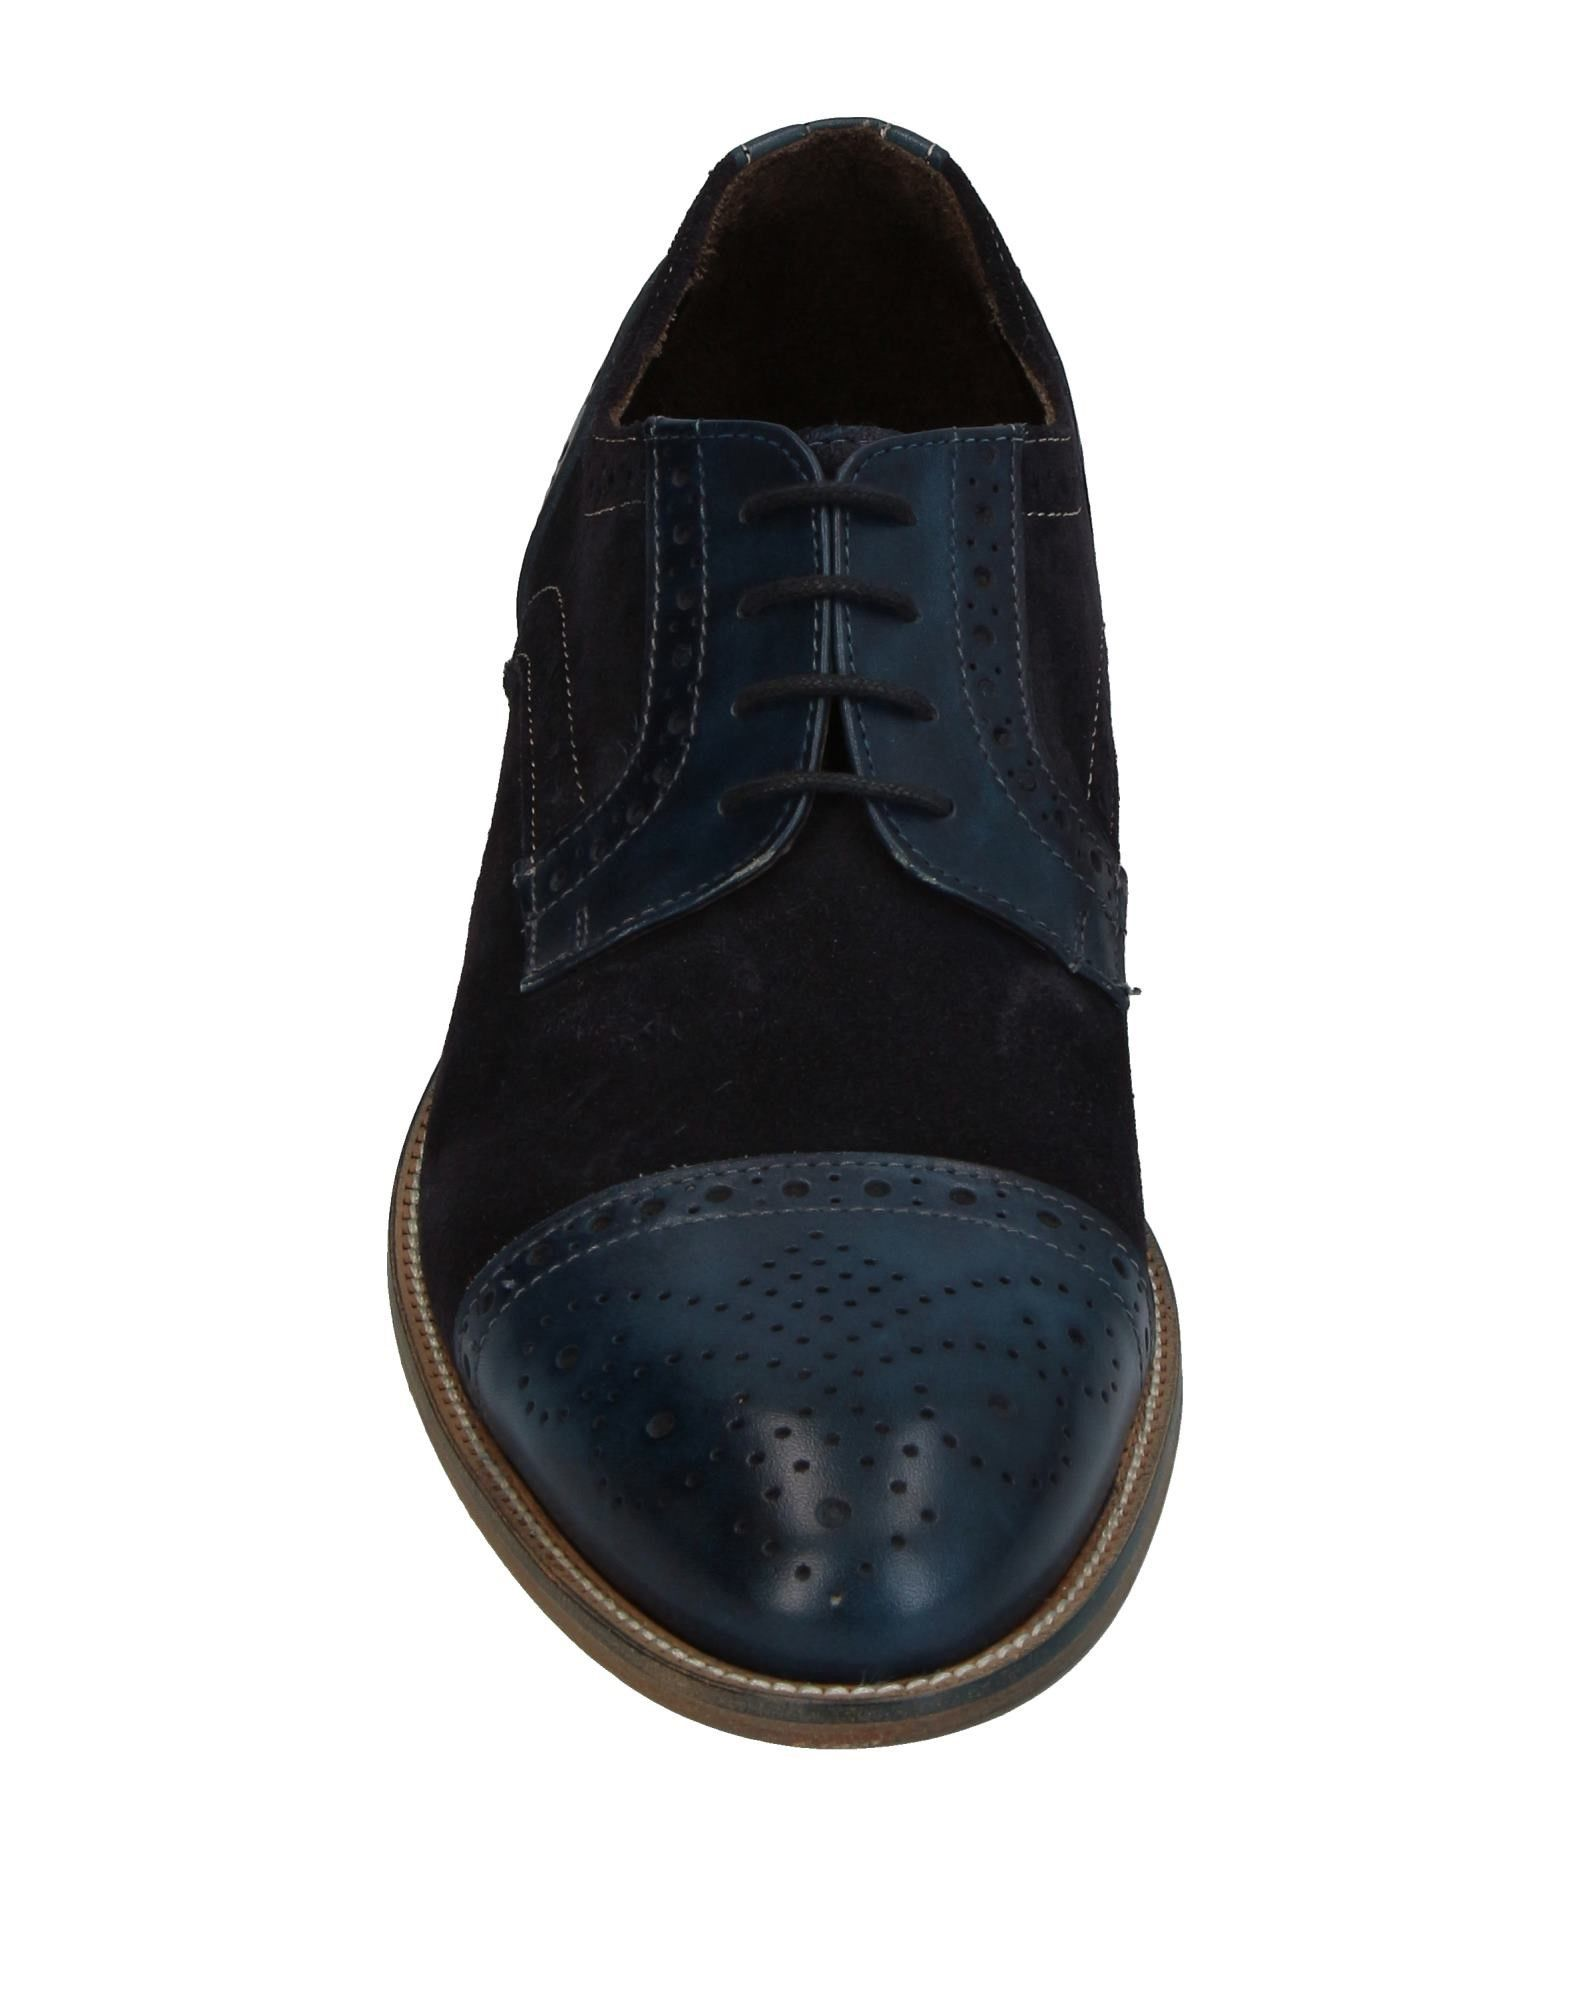 Chaussures À Lacets Brian Dales Homme - Chaussures À Lacets Brian Dales sur